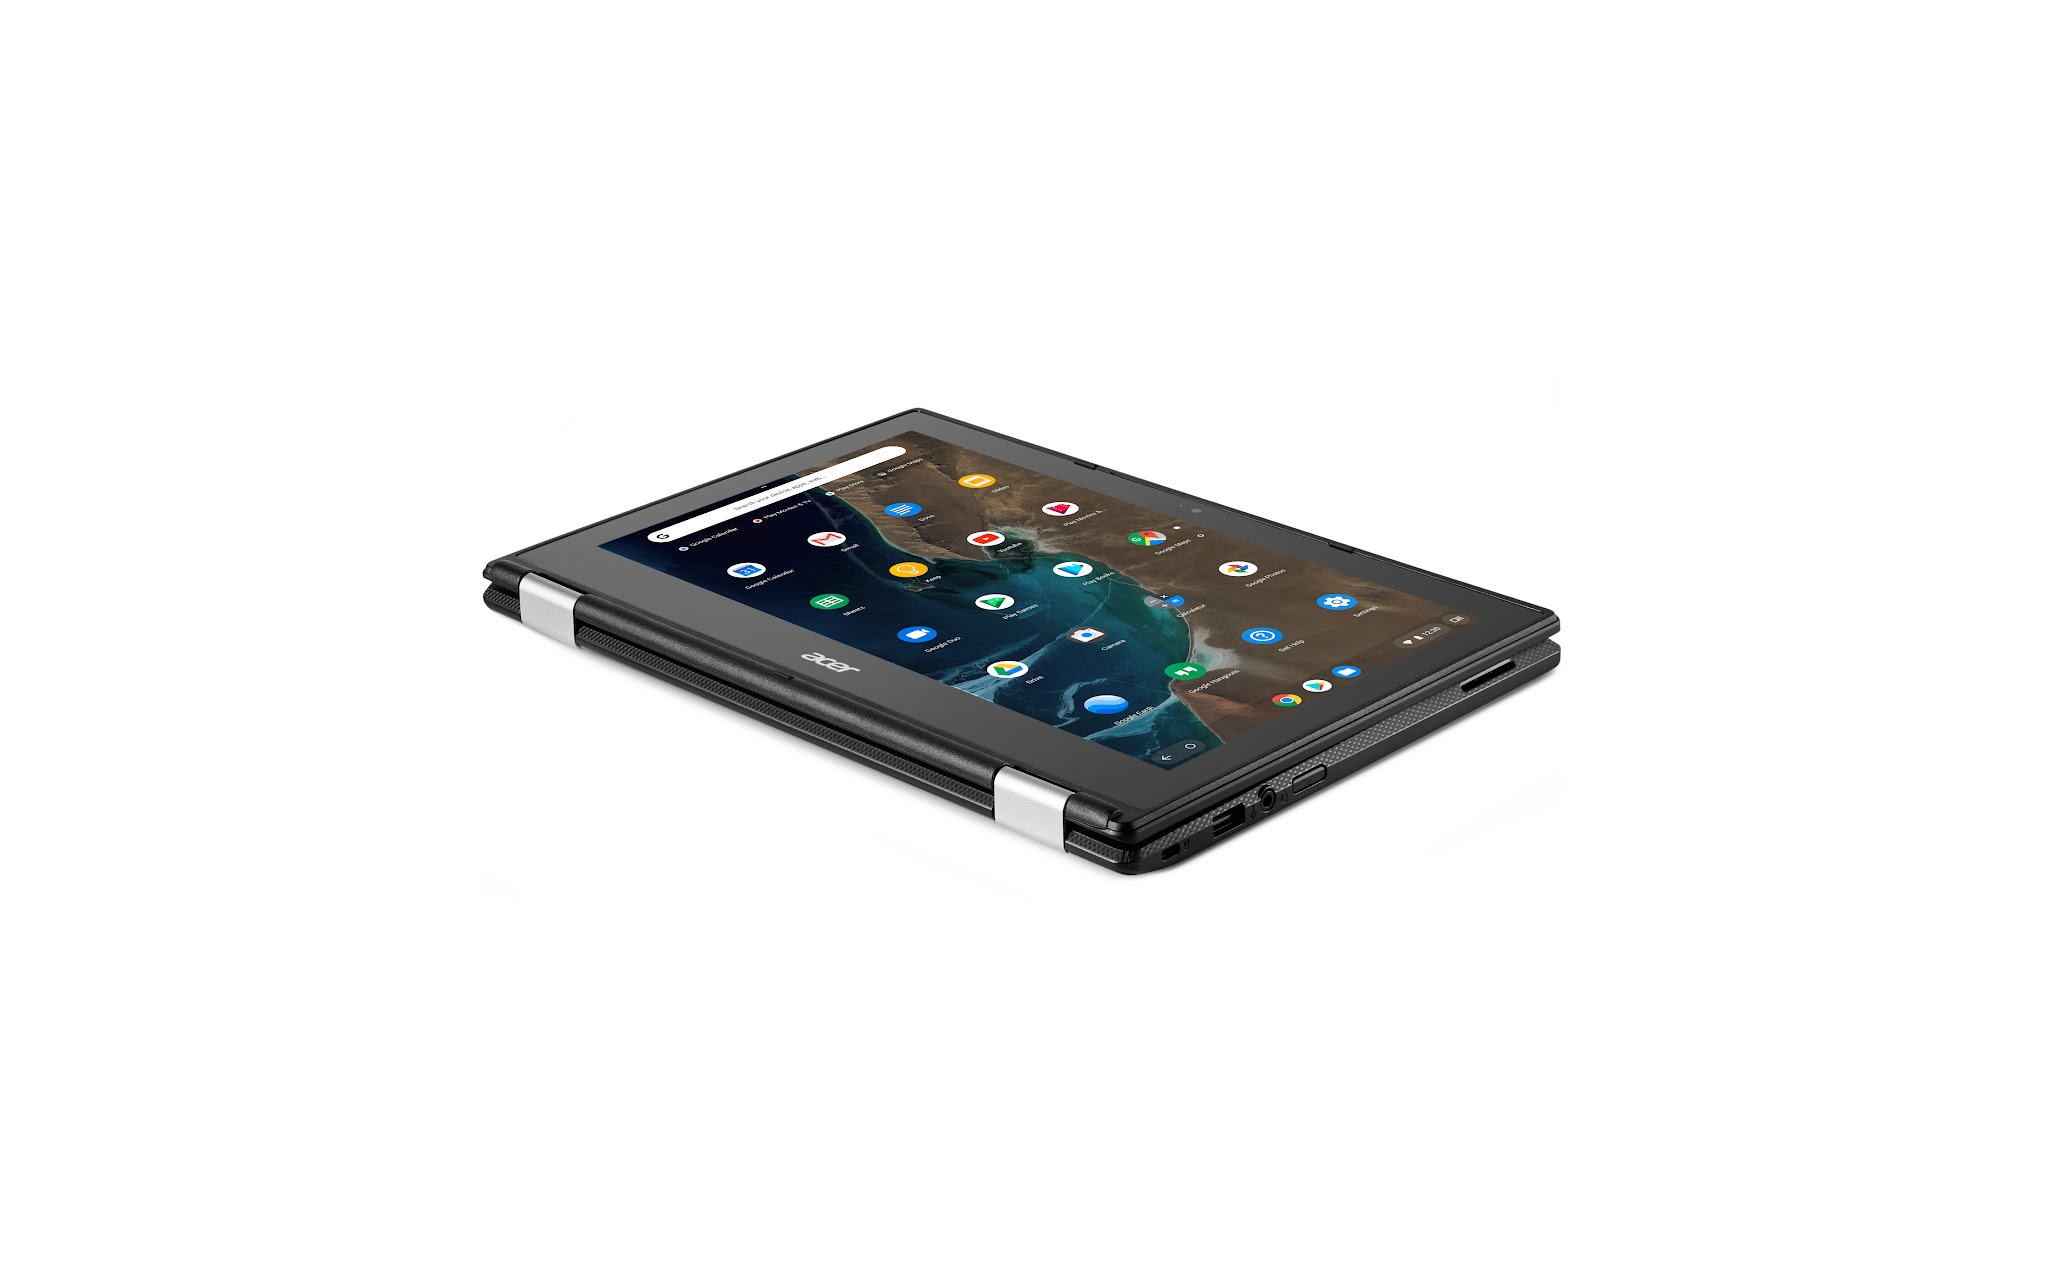 Acer Chromebook R11 (CB5-132T) - photo 4